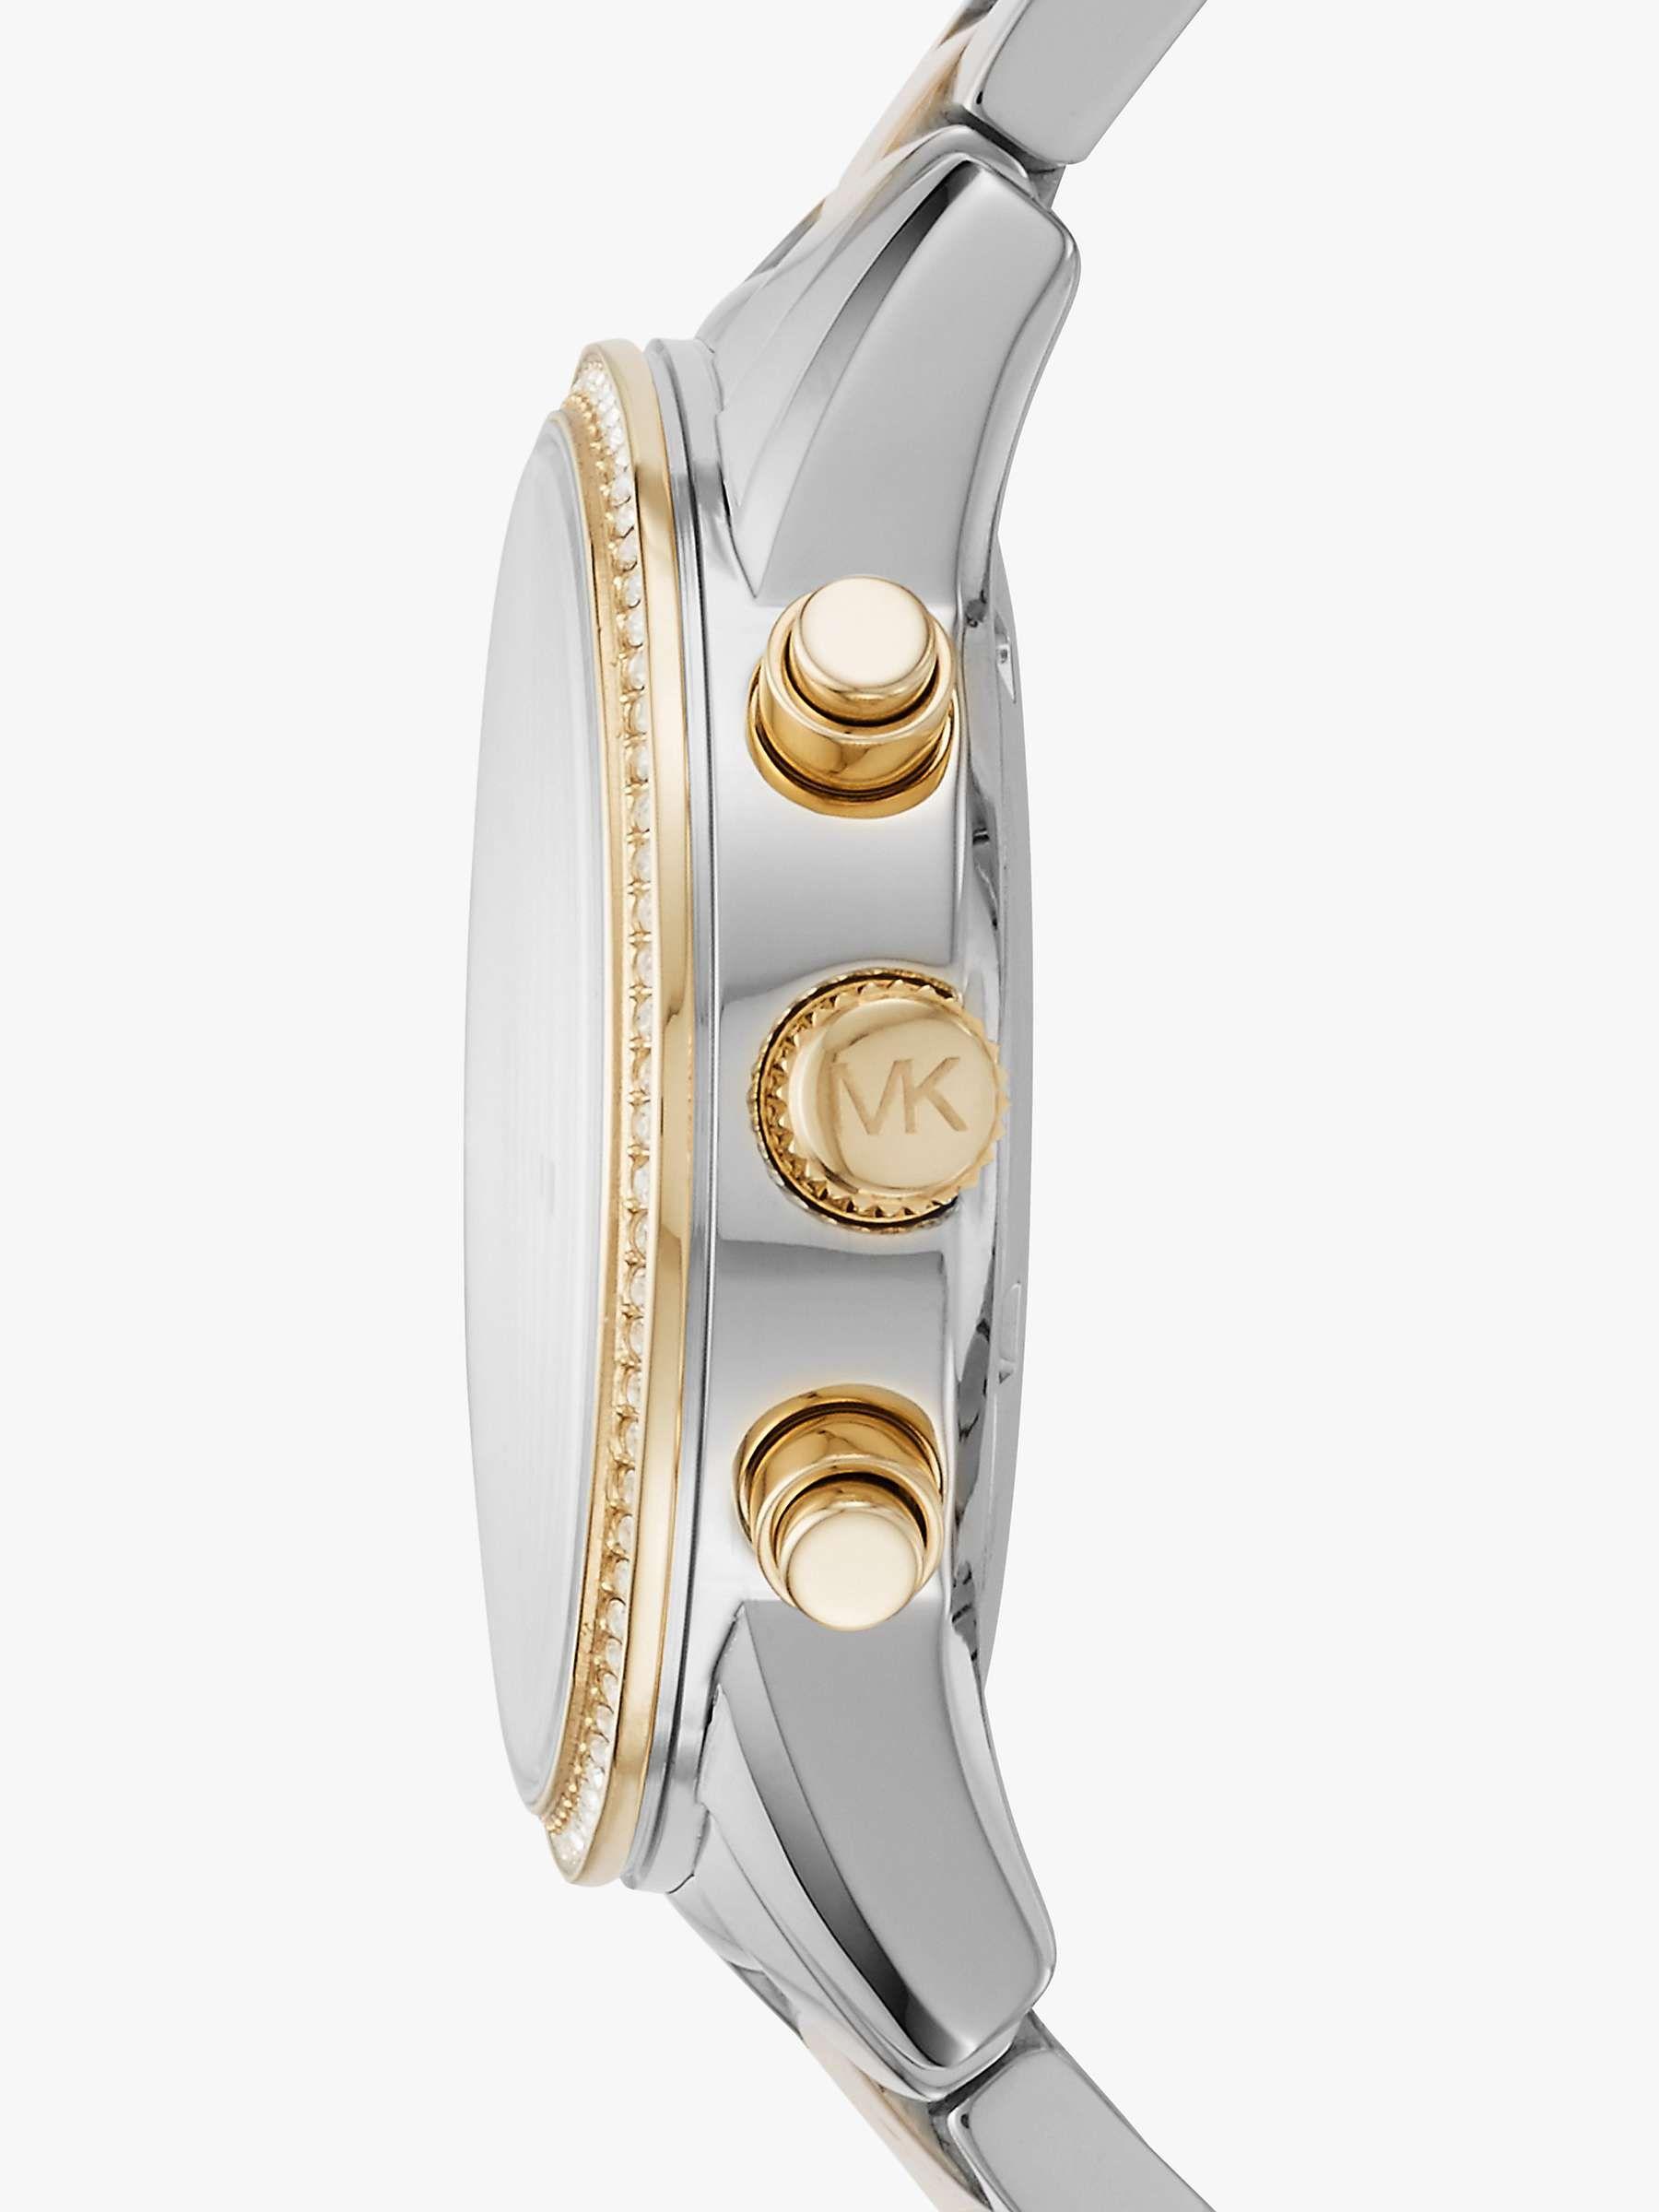 Michael Kors Ladies' Ritz Watch MK6474